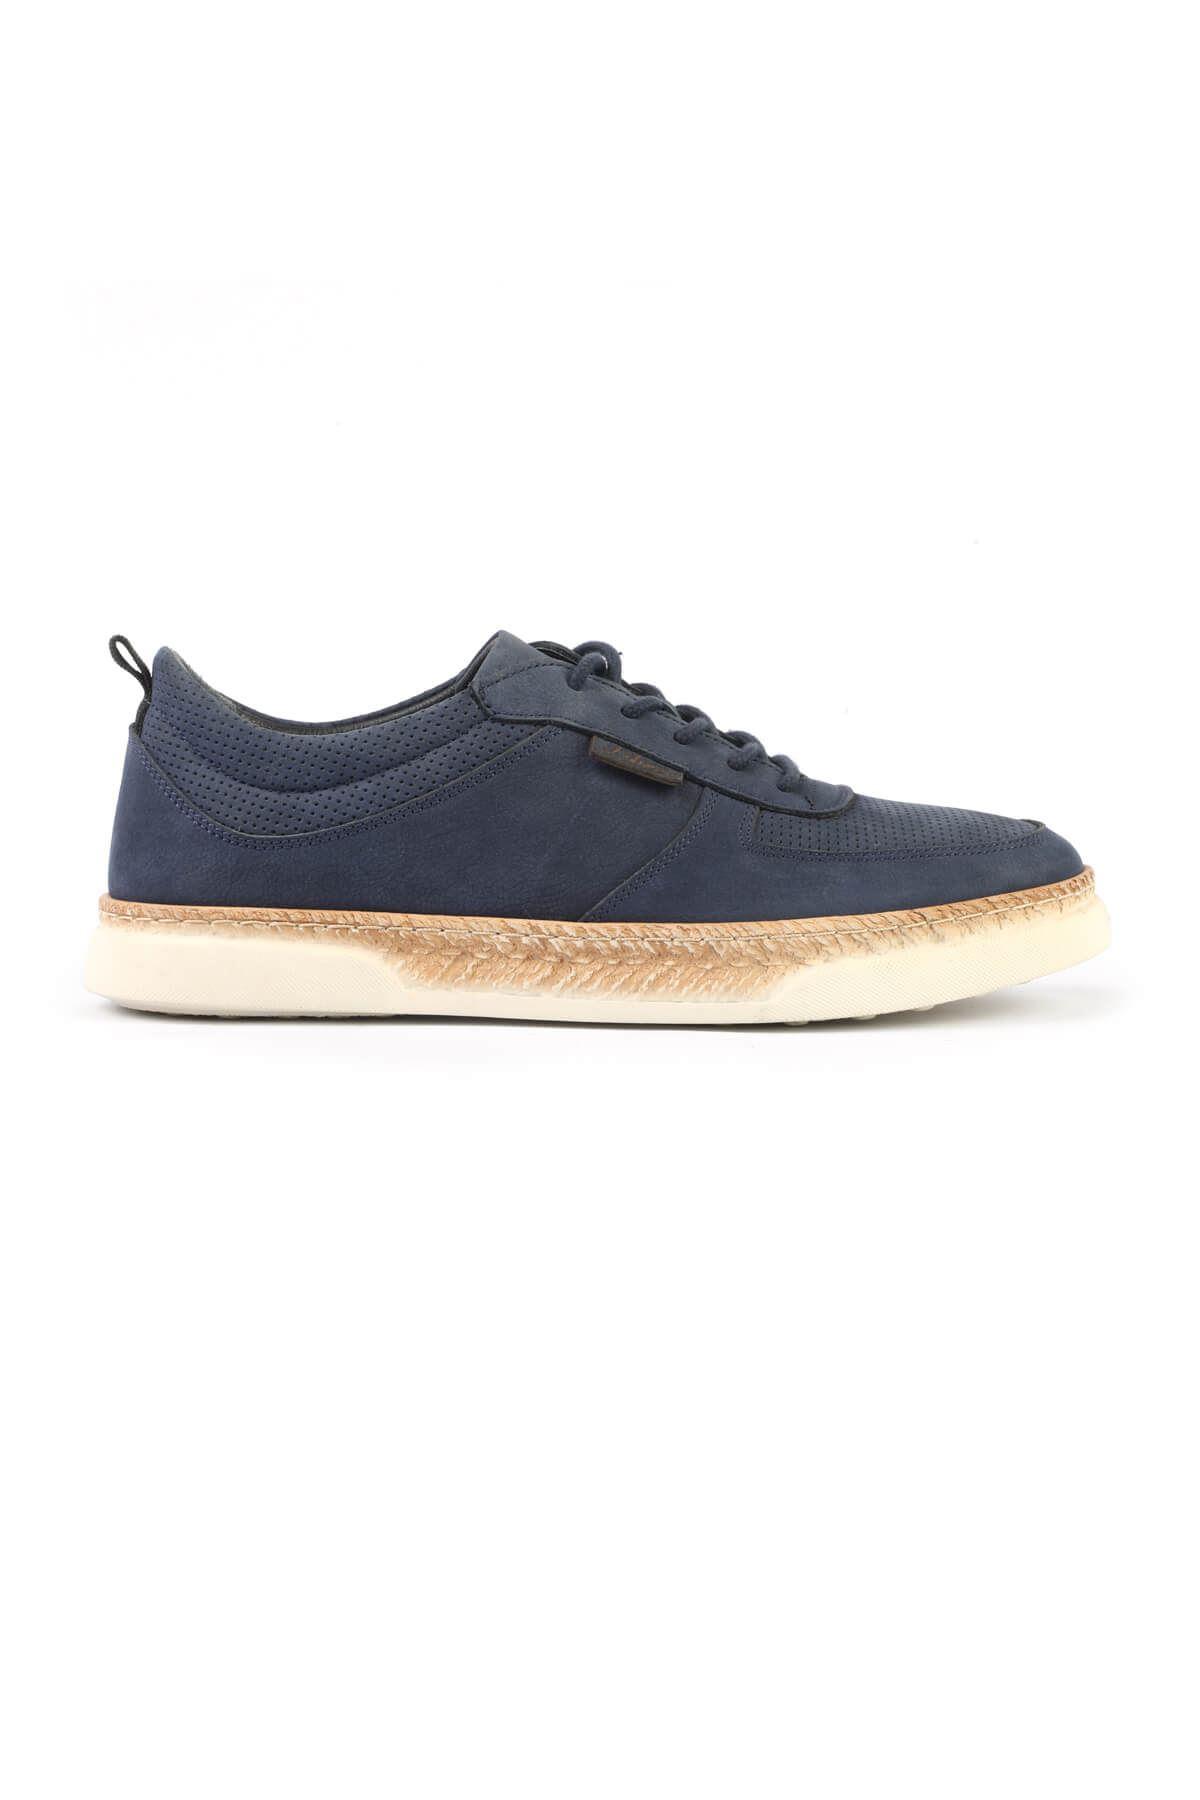 Libero 3007 Navy Blue Casual Shoes